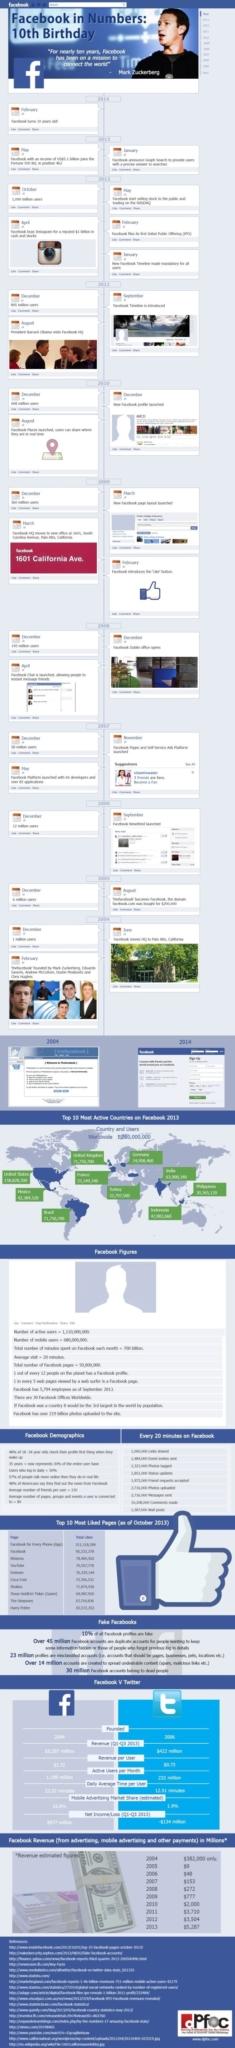 dpfoc-facebook-10y-infographic